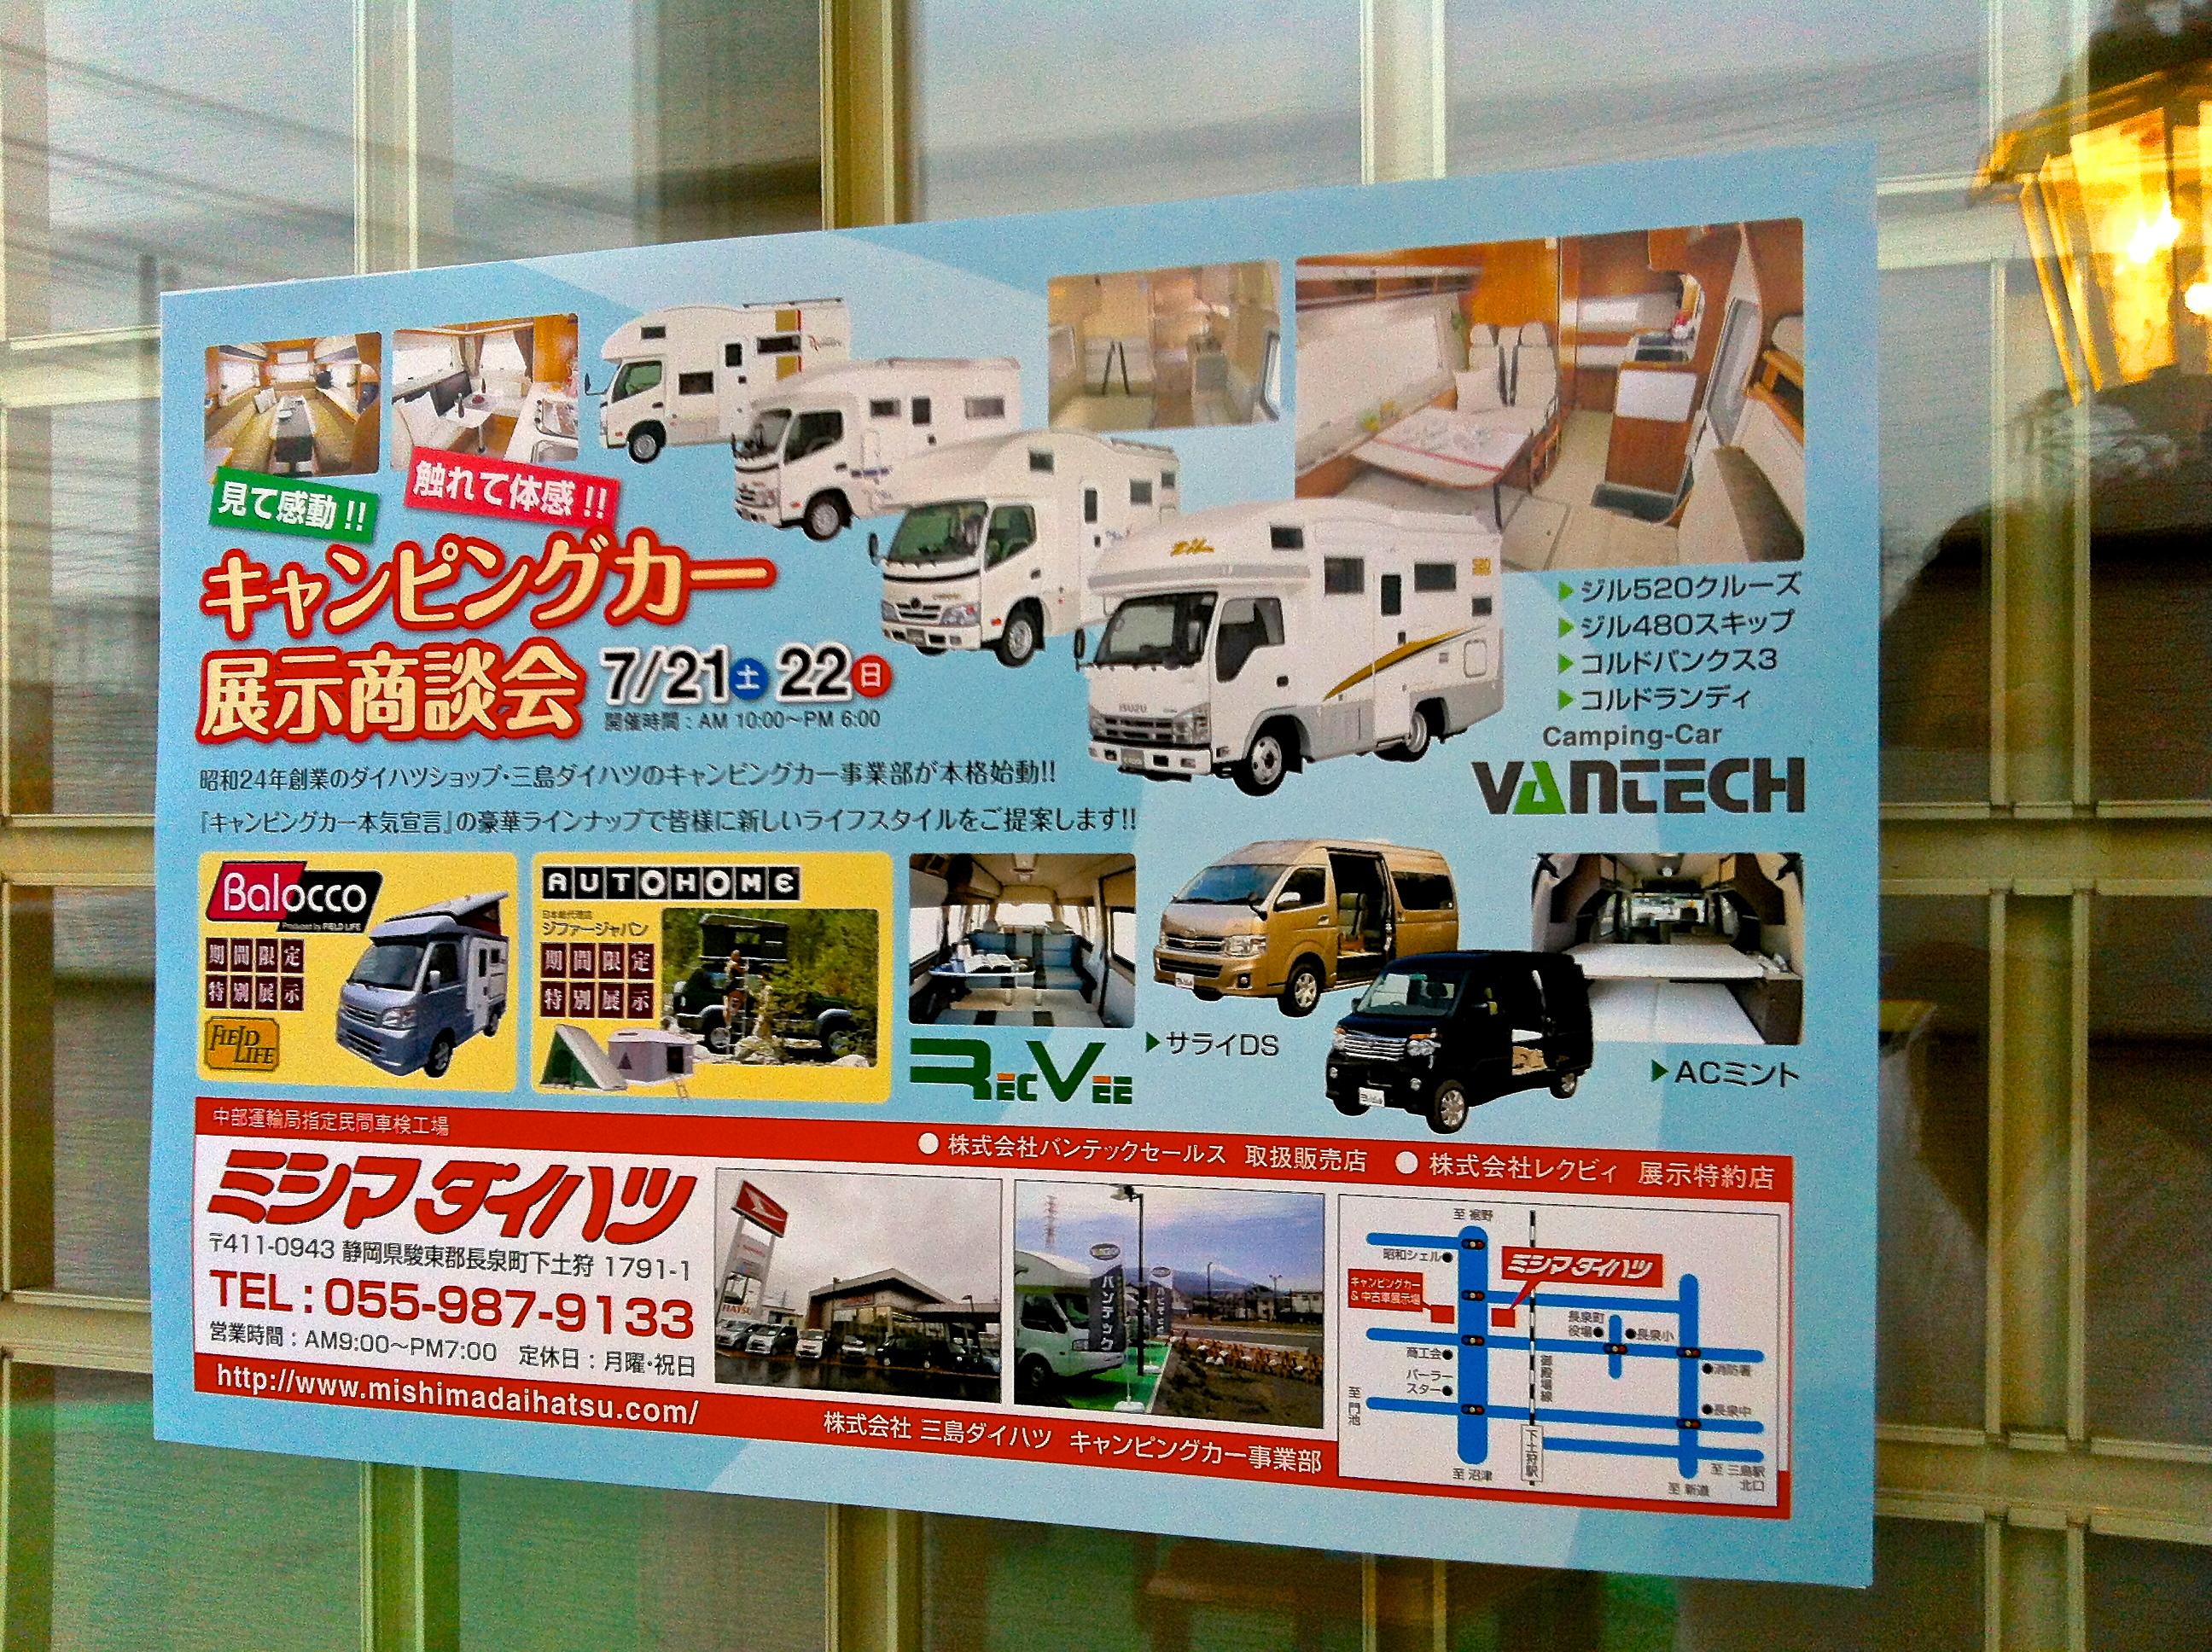 http://www.vantech.jp/shops/info/IMG_0229.JPG